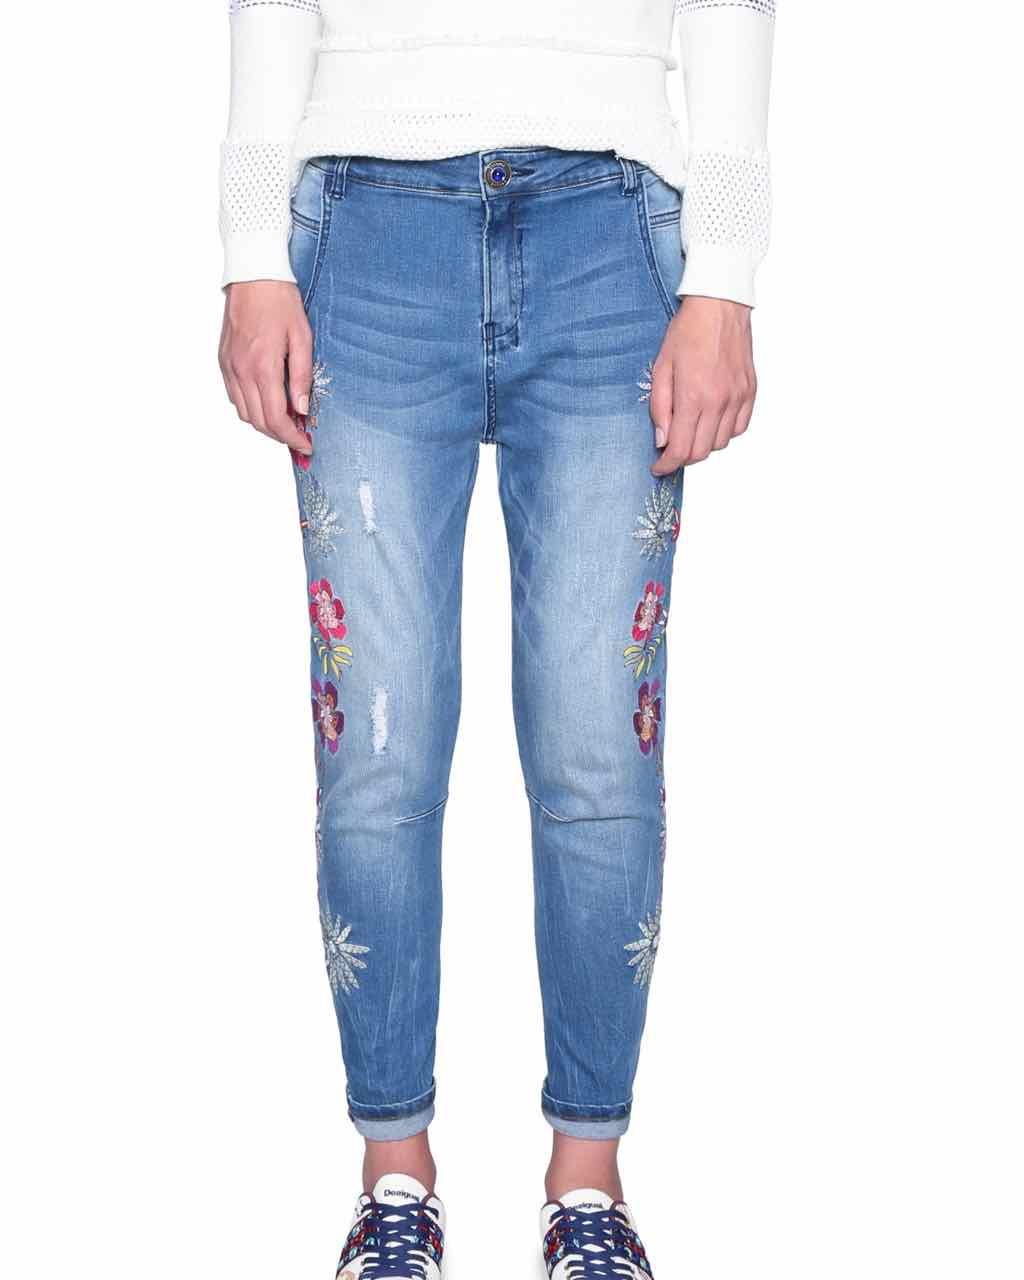 18SWDD59_5053 Desigual Jeans Brazzaville Buy Online